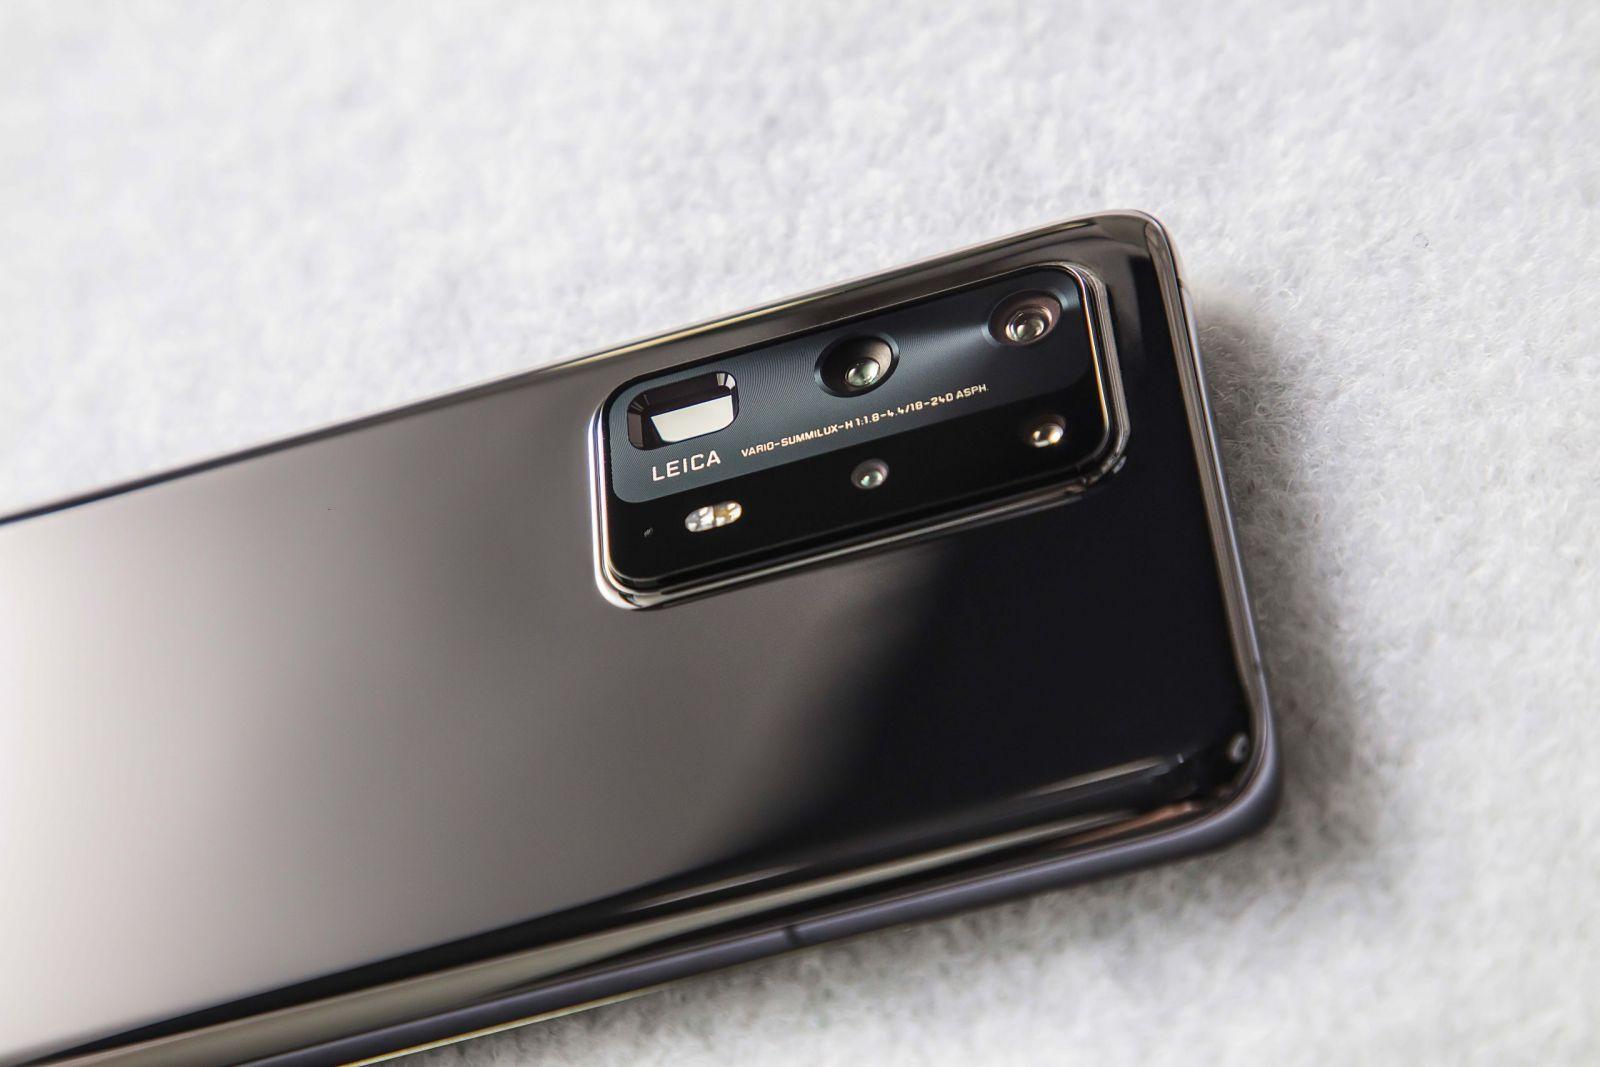 Huawei запускает смартфон Huawei P40 Pro+ в России (10491869 1 scaled)